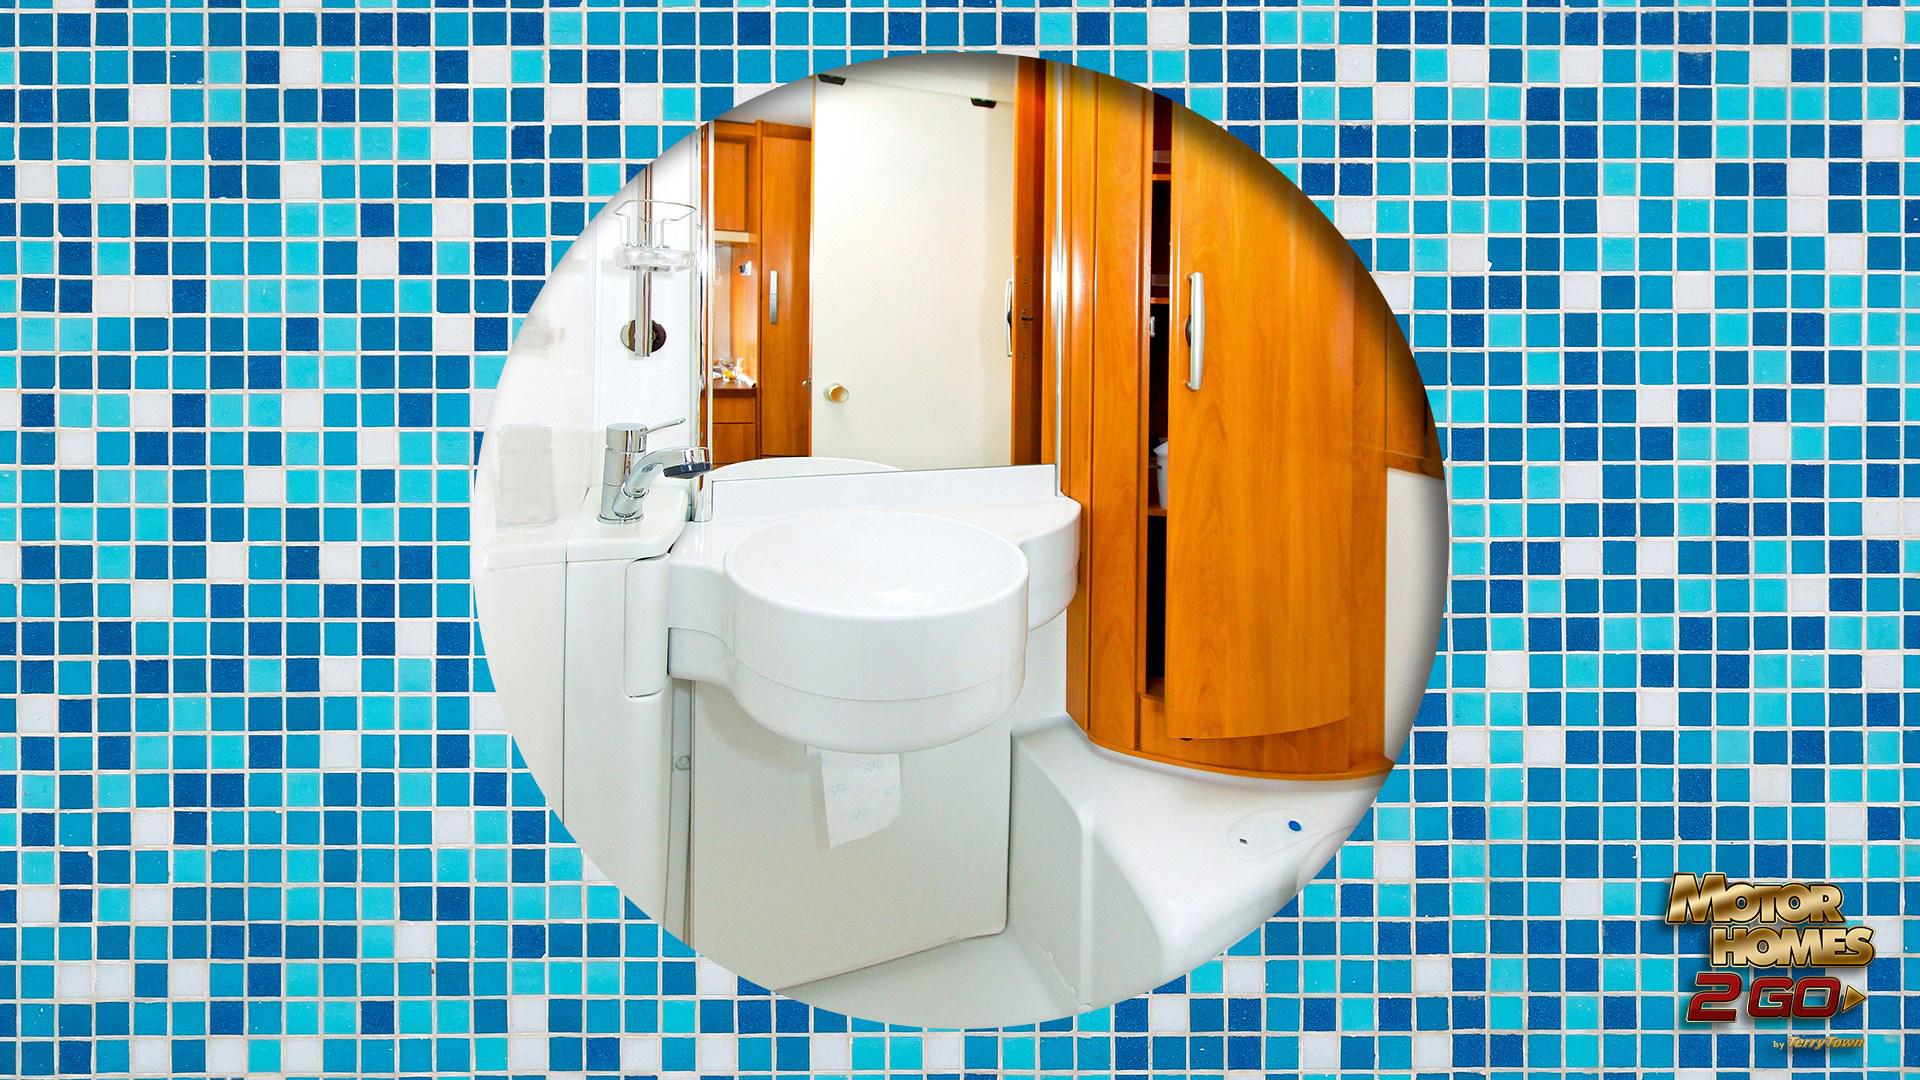 Bathroom Organizational Hacks. Motorhomes 2 Go RV Blog